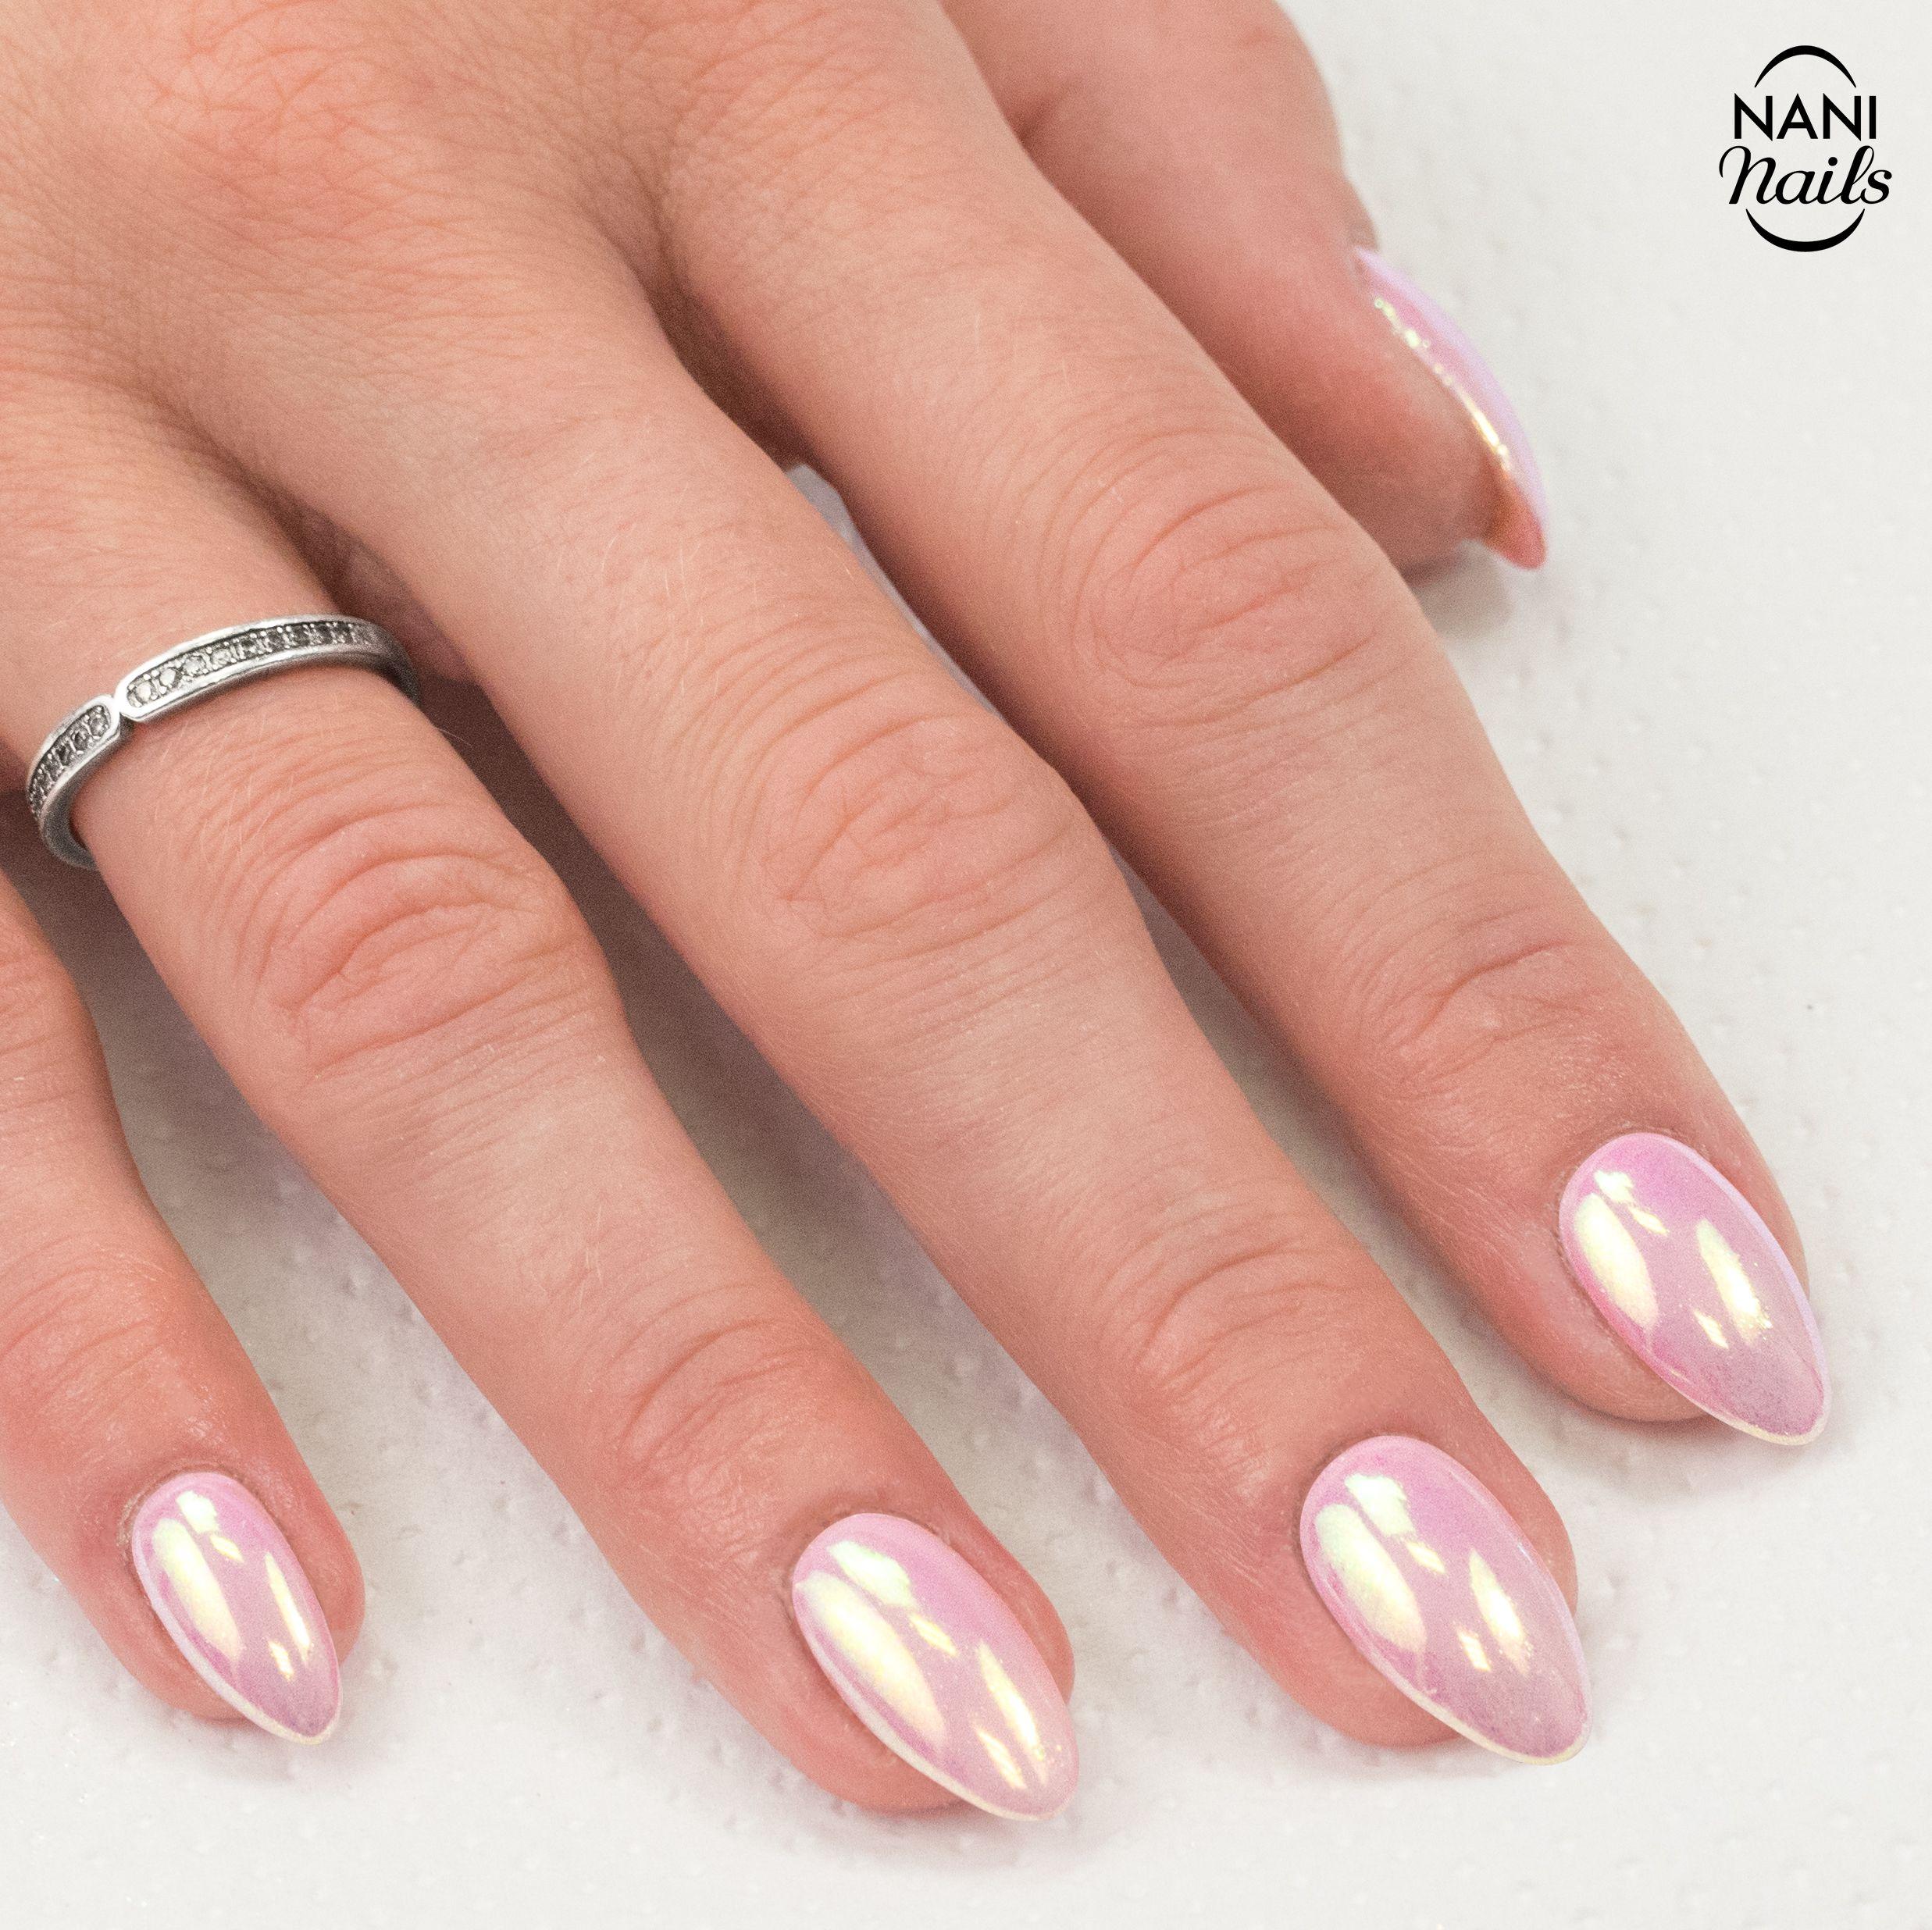 Neonail Lestici Pigment Pearl Effect With Images Gelove Nehty Manikura Nehet